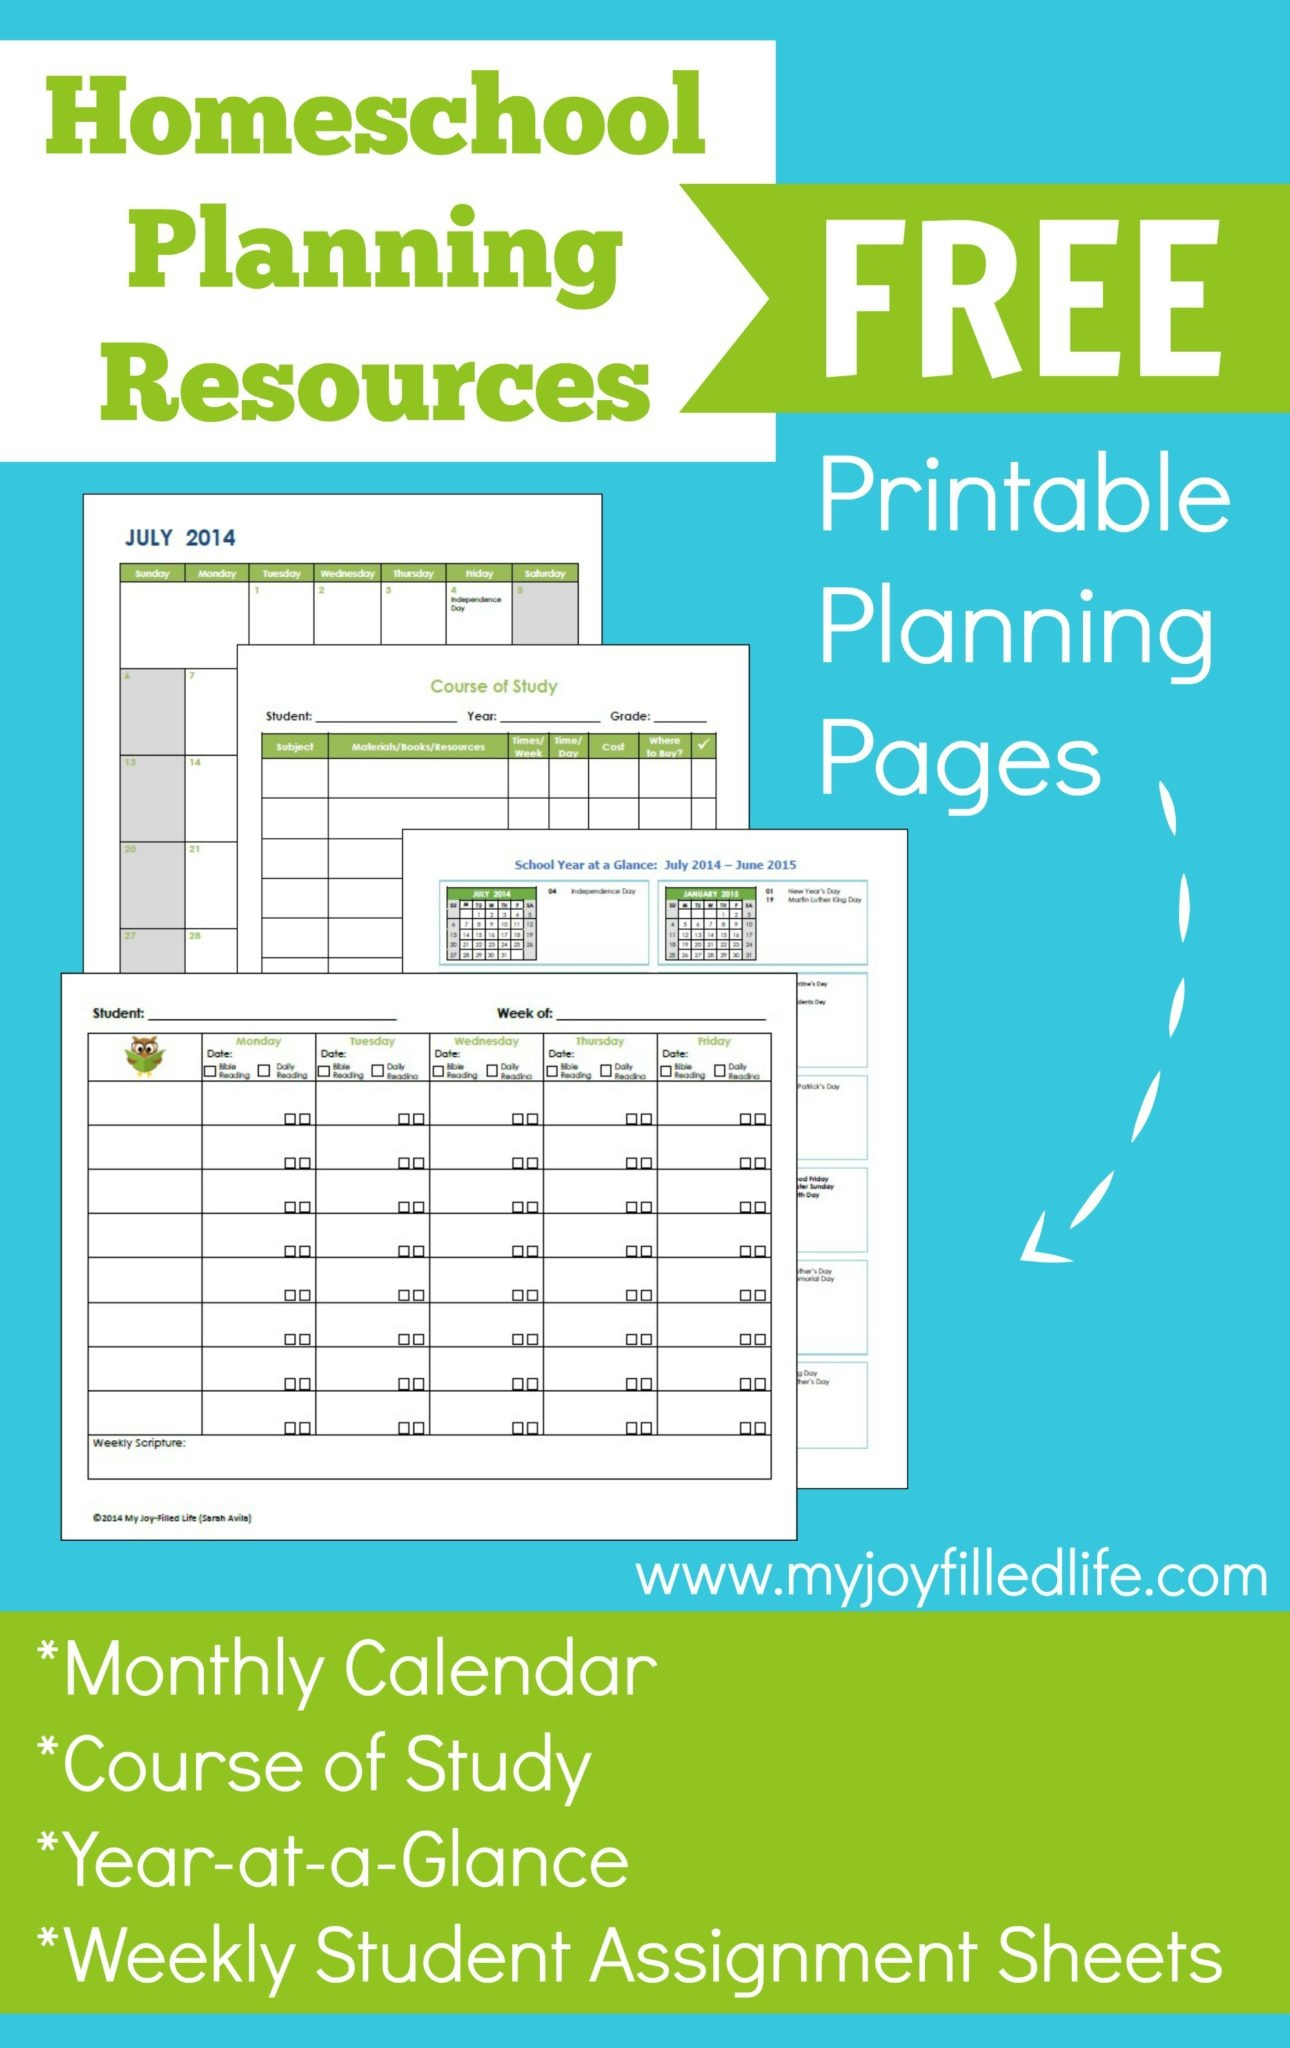 Homeschool Planning Resources & Free Printables - My Joy-Filled Life - Free Printable Homeschool Curriculum